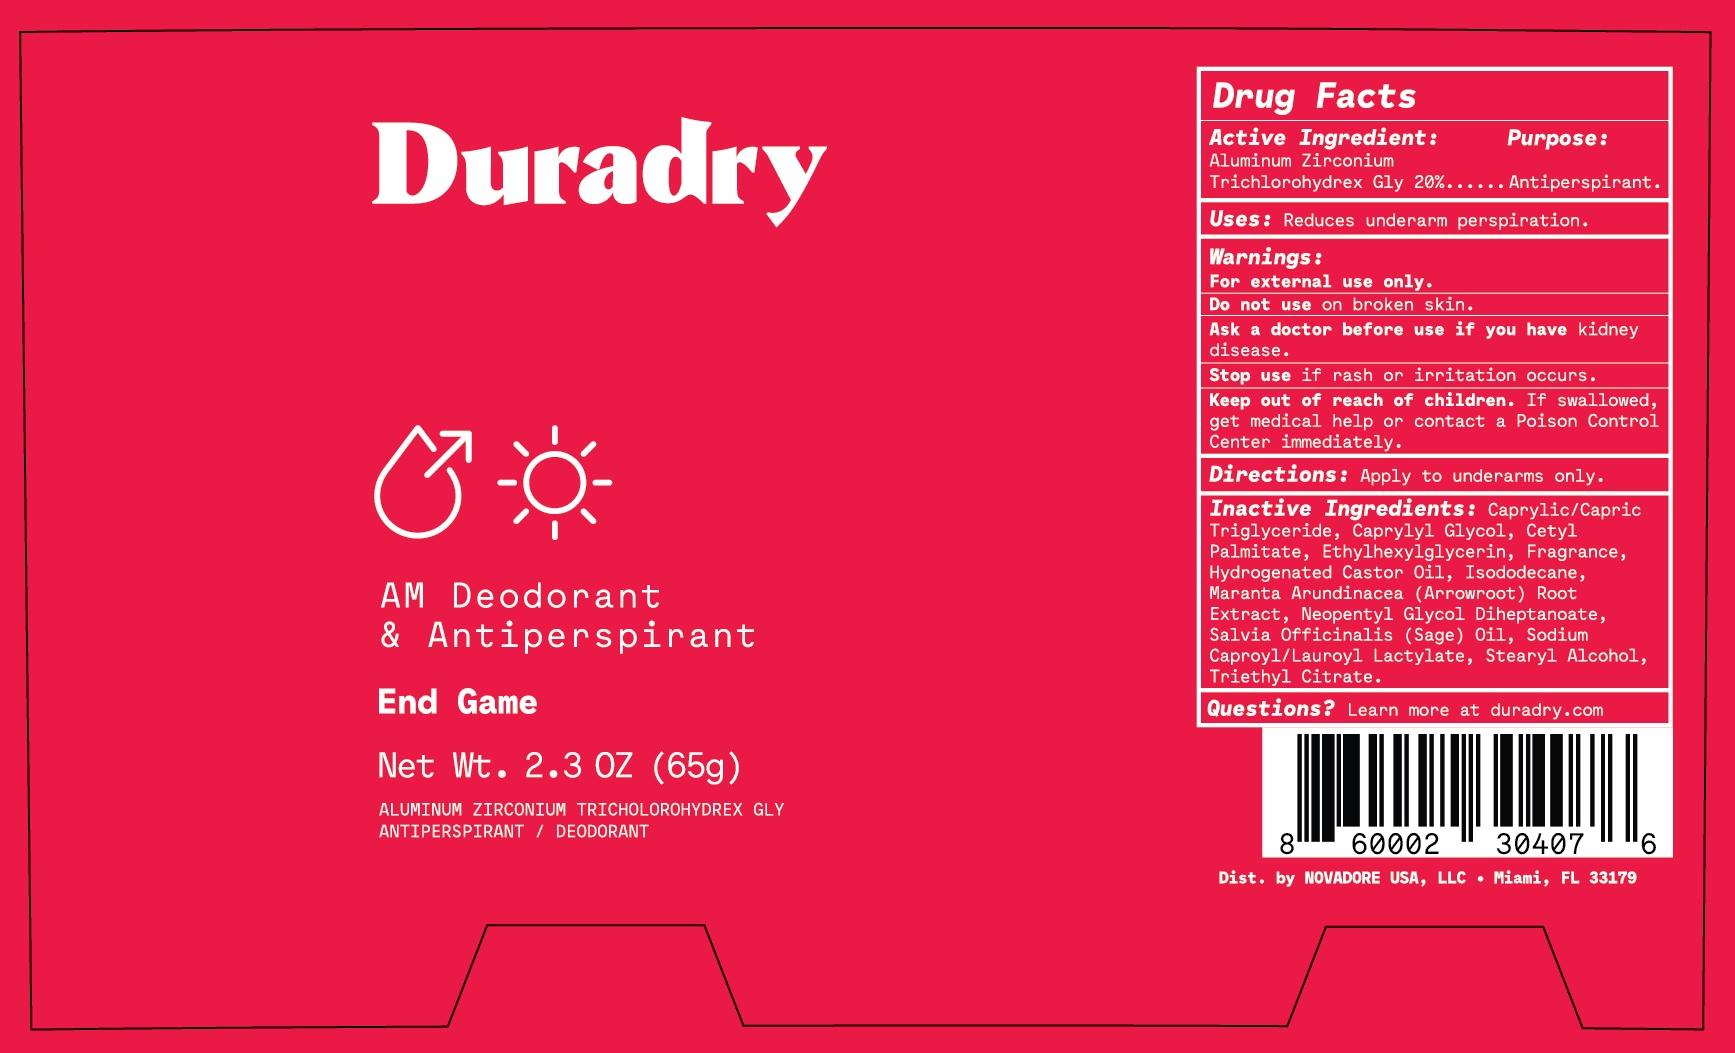 Duradry AM End Game